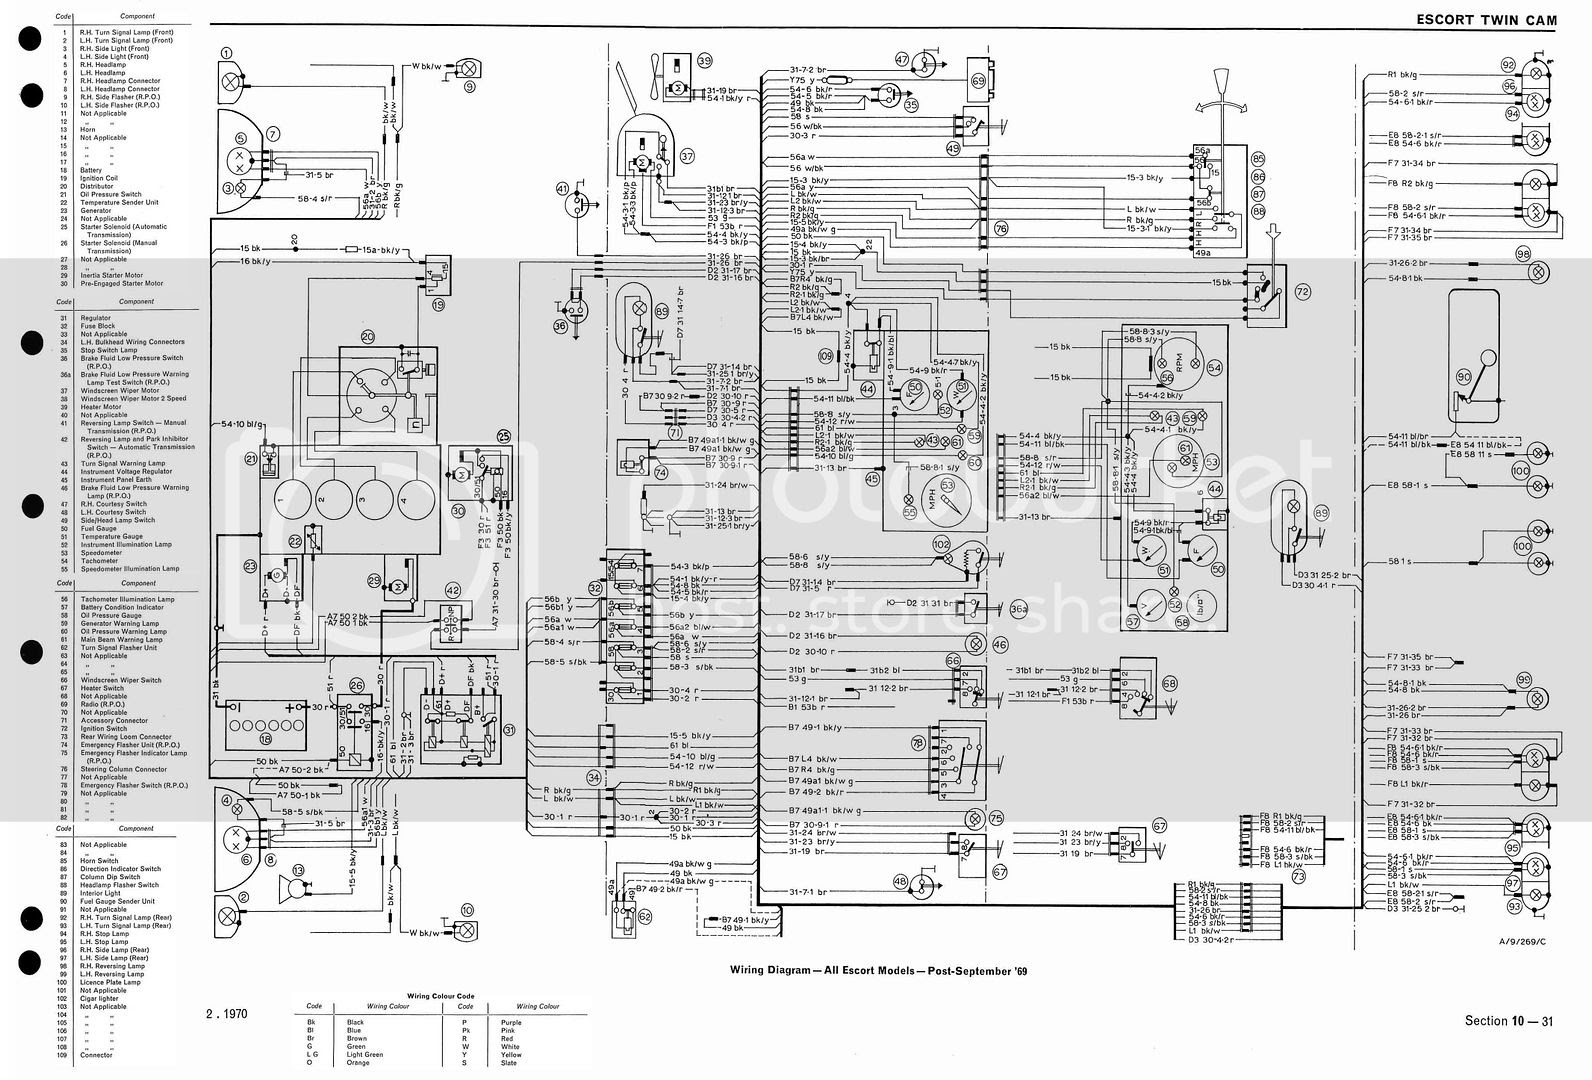 94 acura legend stereo wiring diagram vascular plant 89 hp photosmart printer